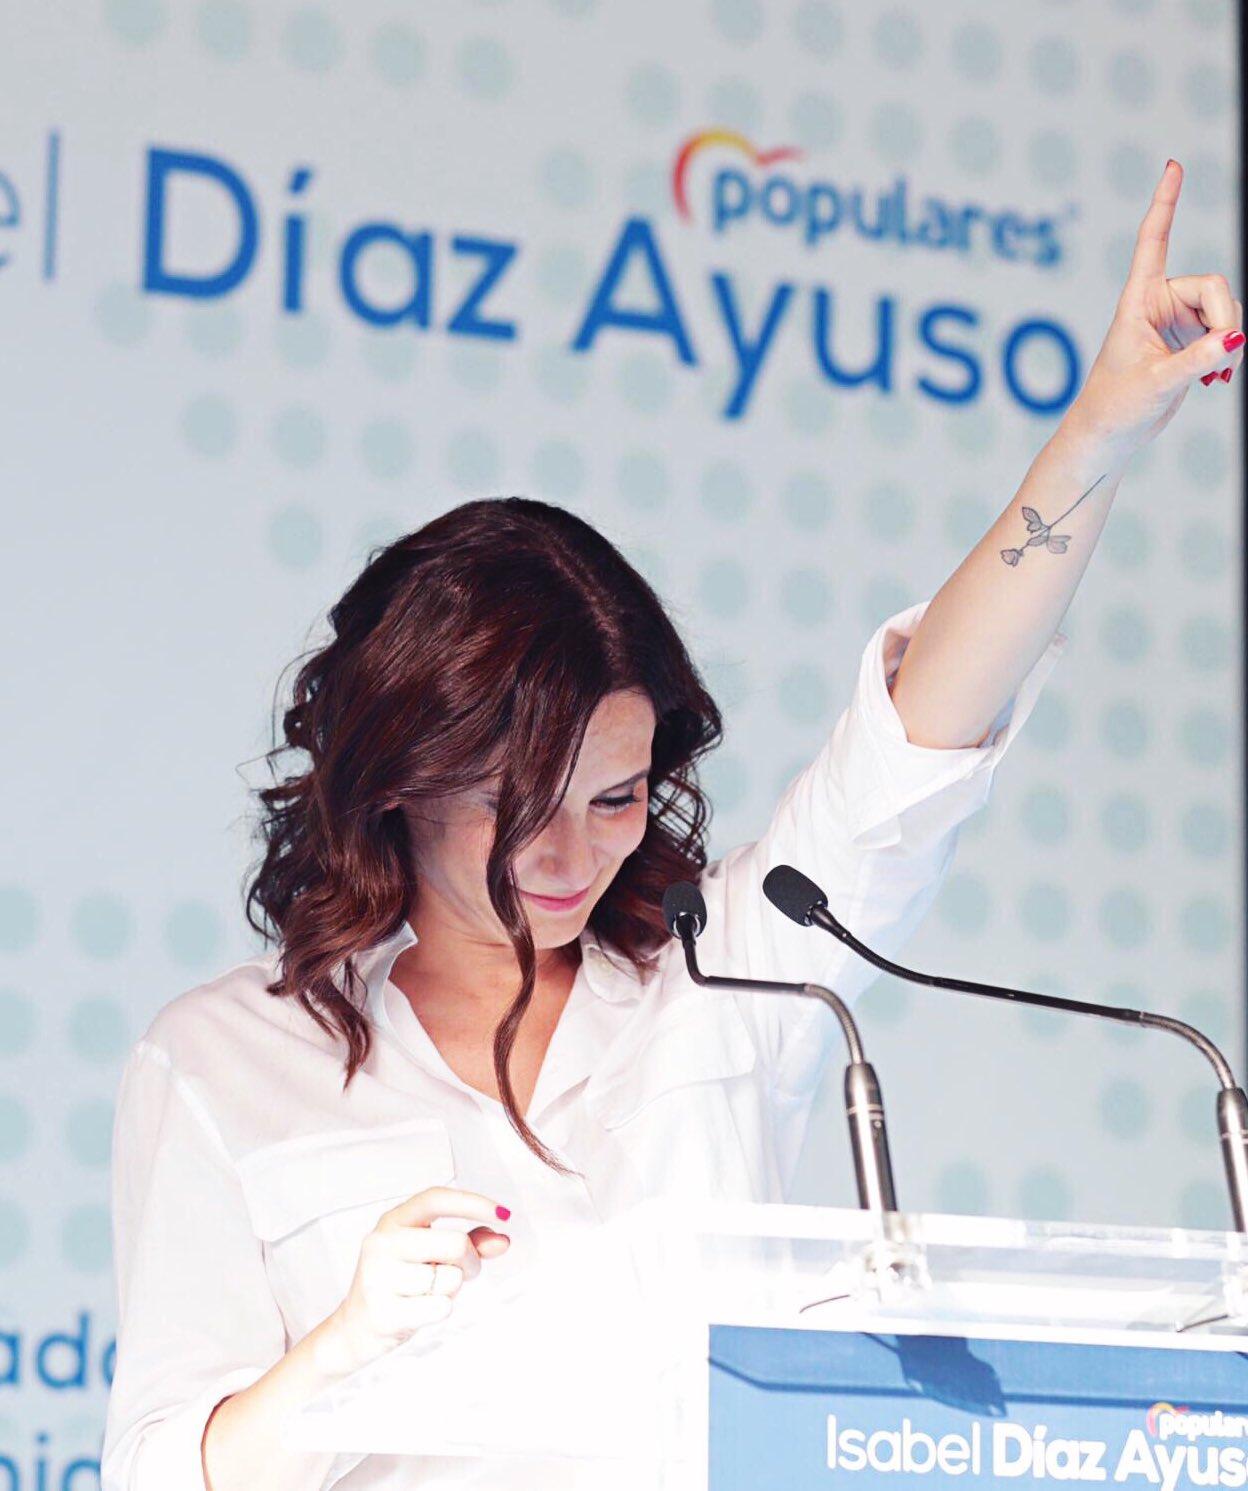 Isabel Díaz Ayuso - Página 11 D7SQIWAXsAAp_Wo?format=jpg&name=large